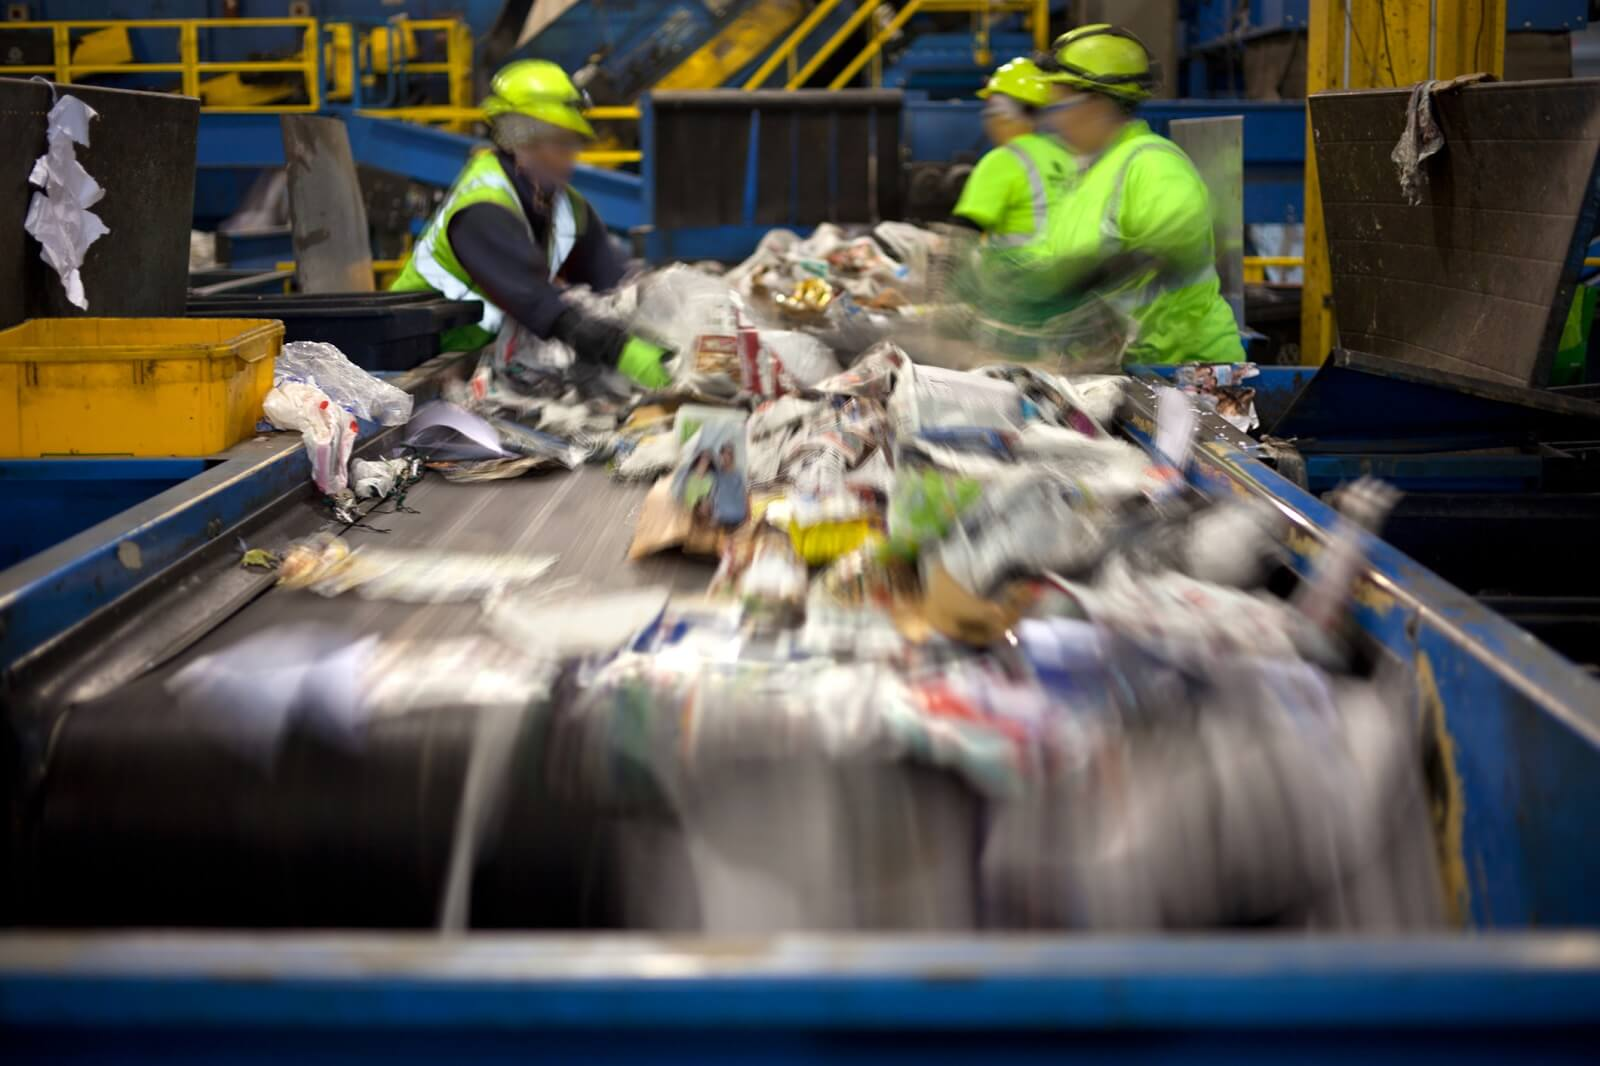 odpady bio